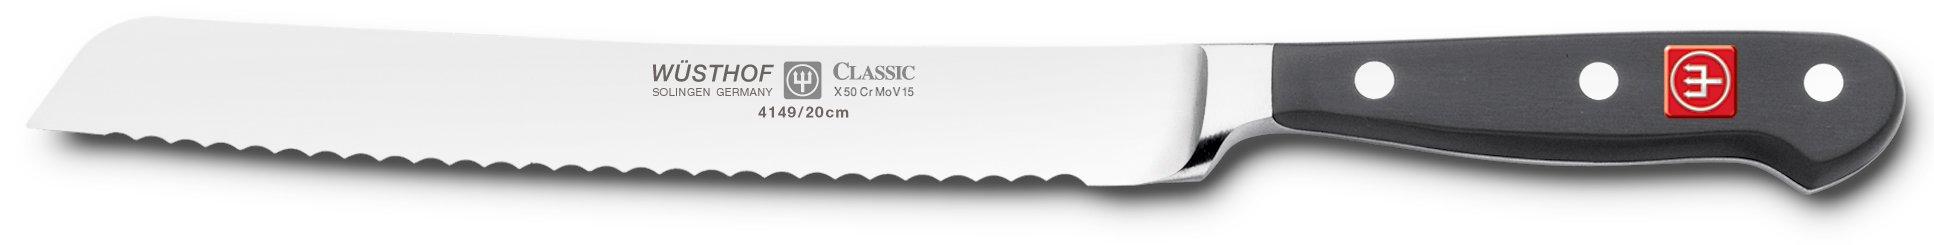 Wusthof Classic 8-Inch Bread Knife by Wüsthof